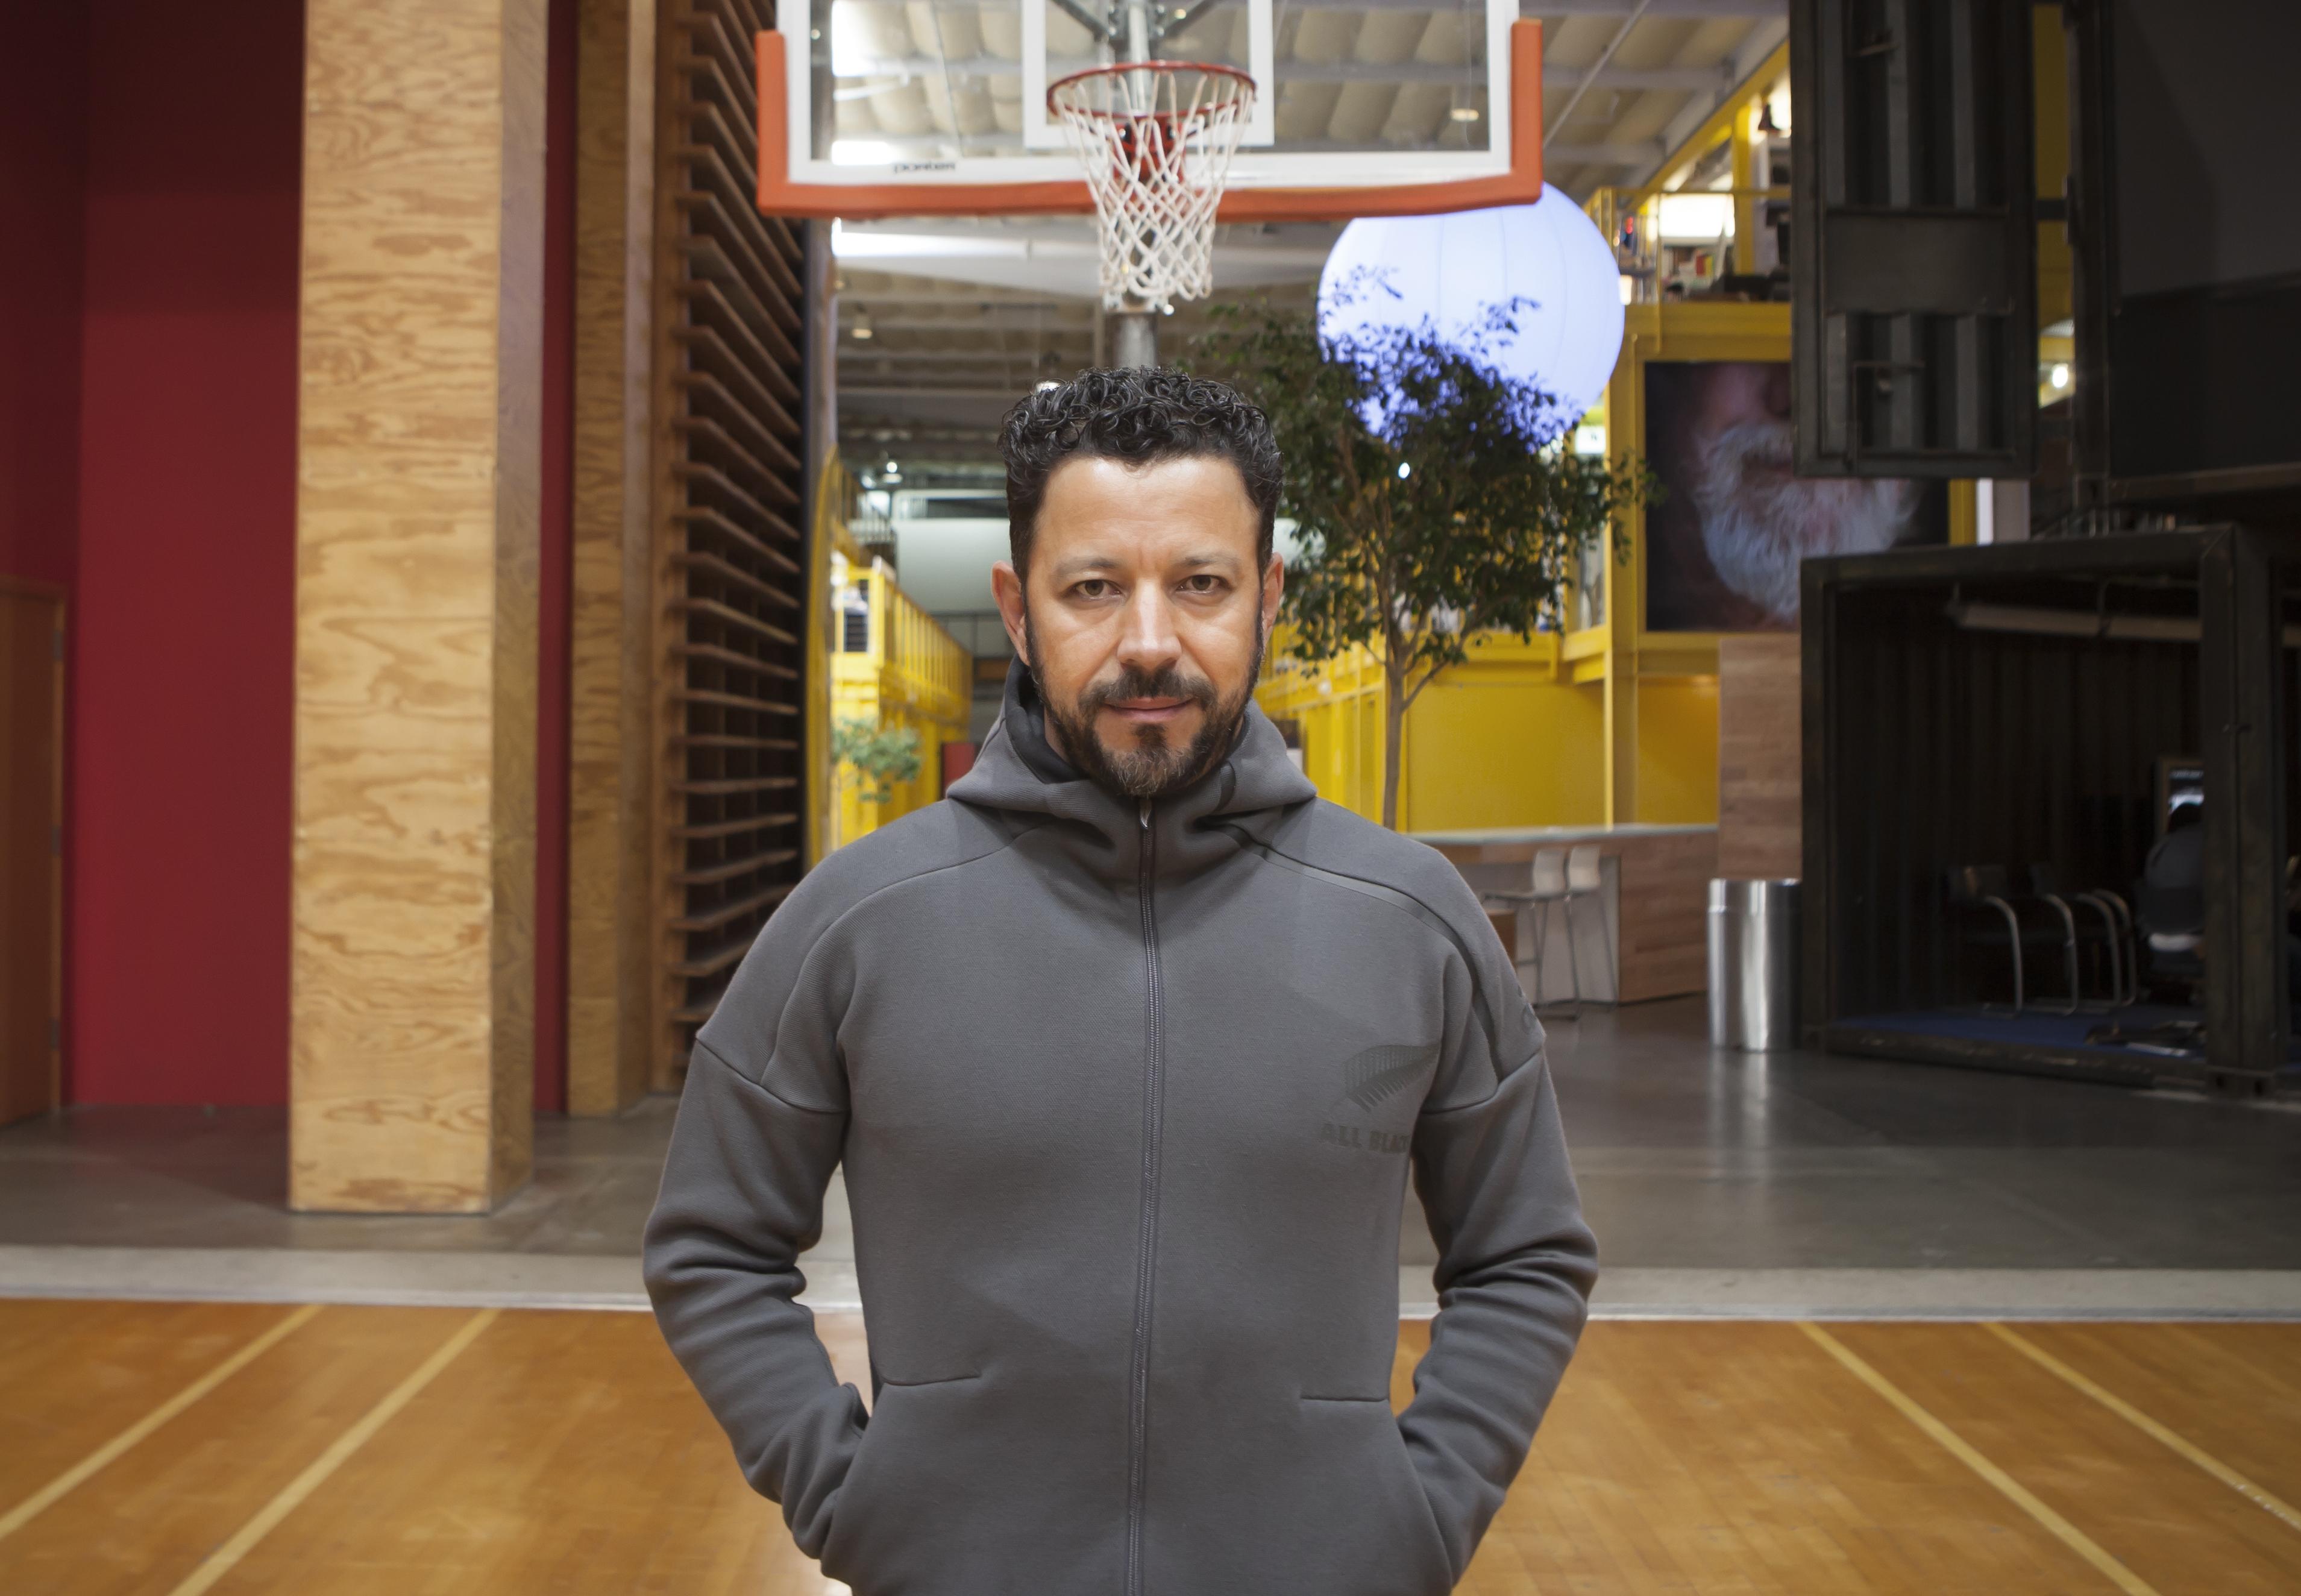 TBWA\Chiat\Day LA's Renato Fernandez on life in LA